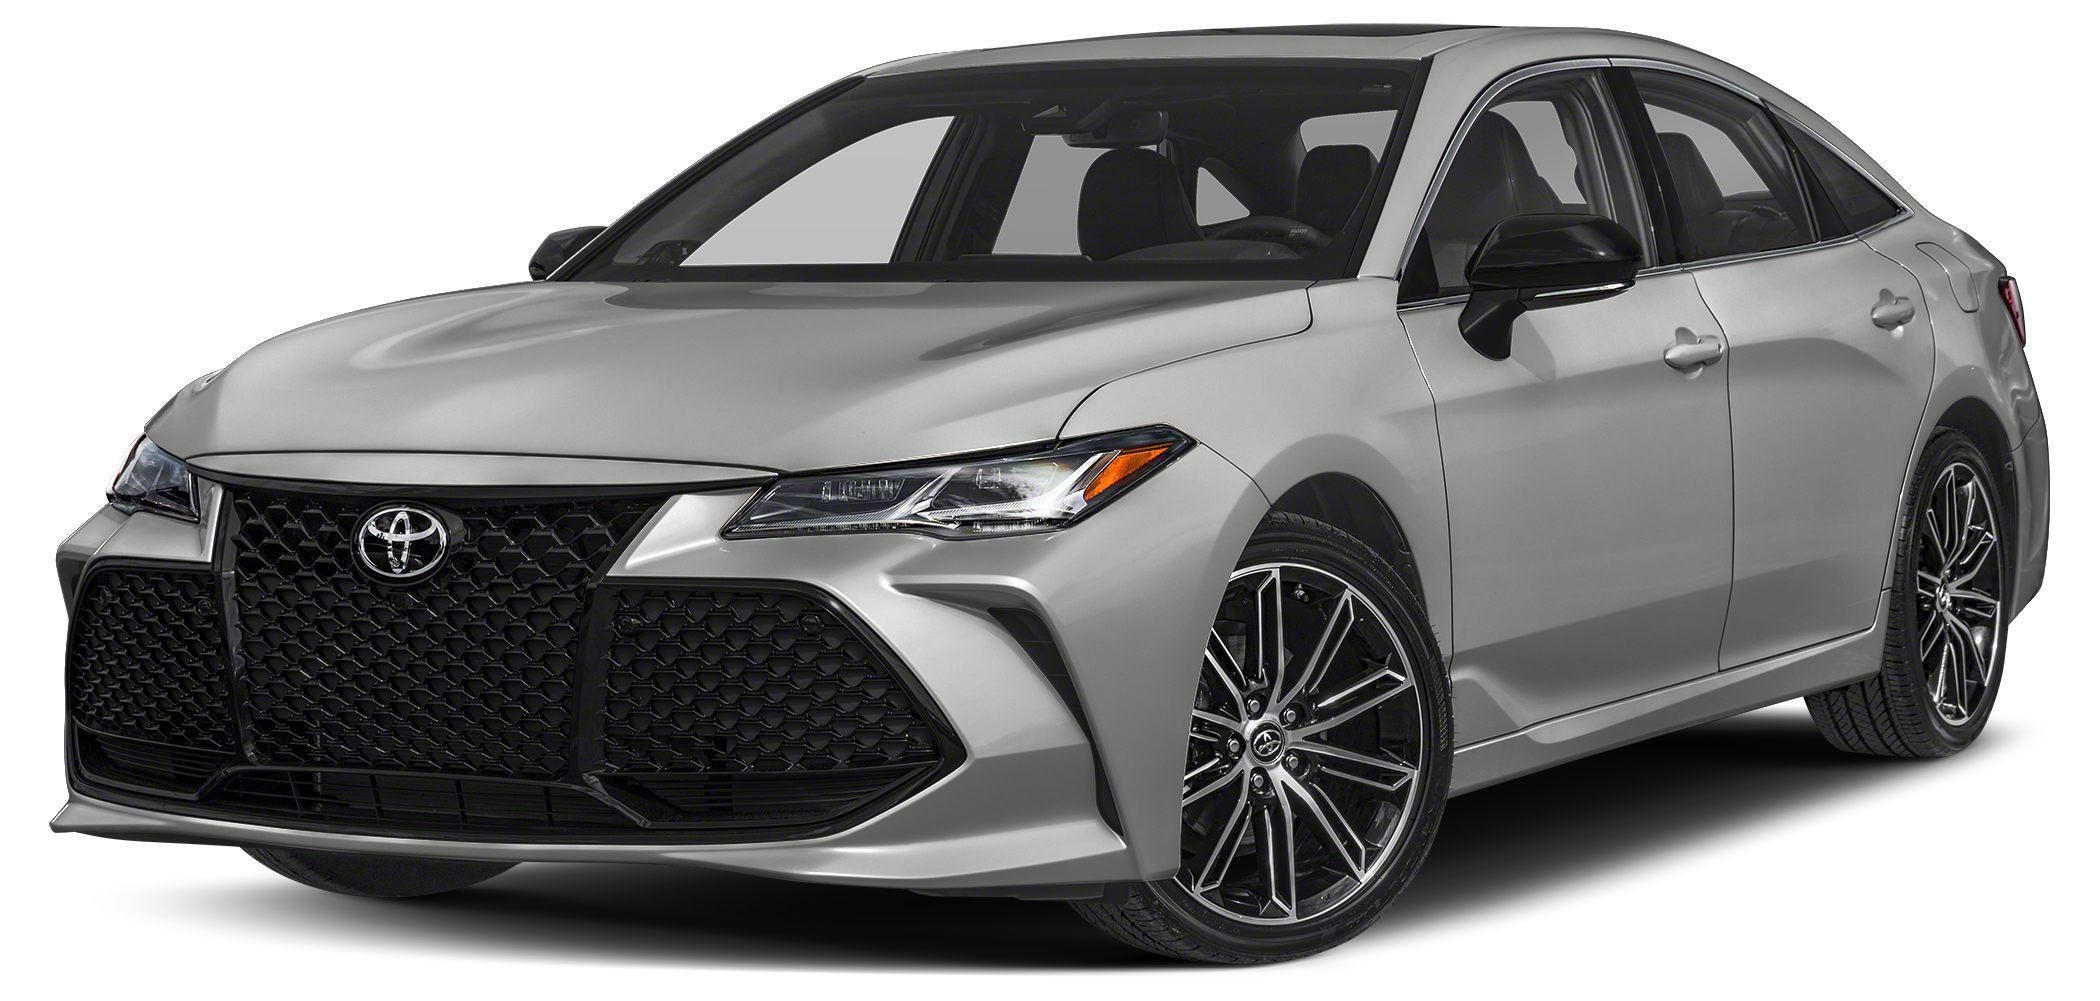 2019 Toyota Avalon XLE Heated Seats Dual Zone AC Keyless Start Back-Up Camera Alloy Wheels S